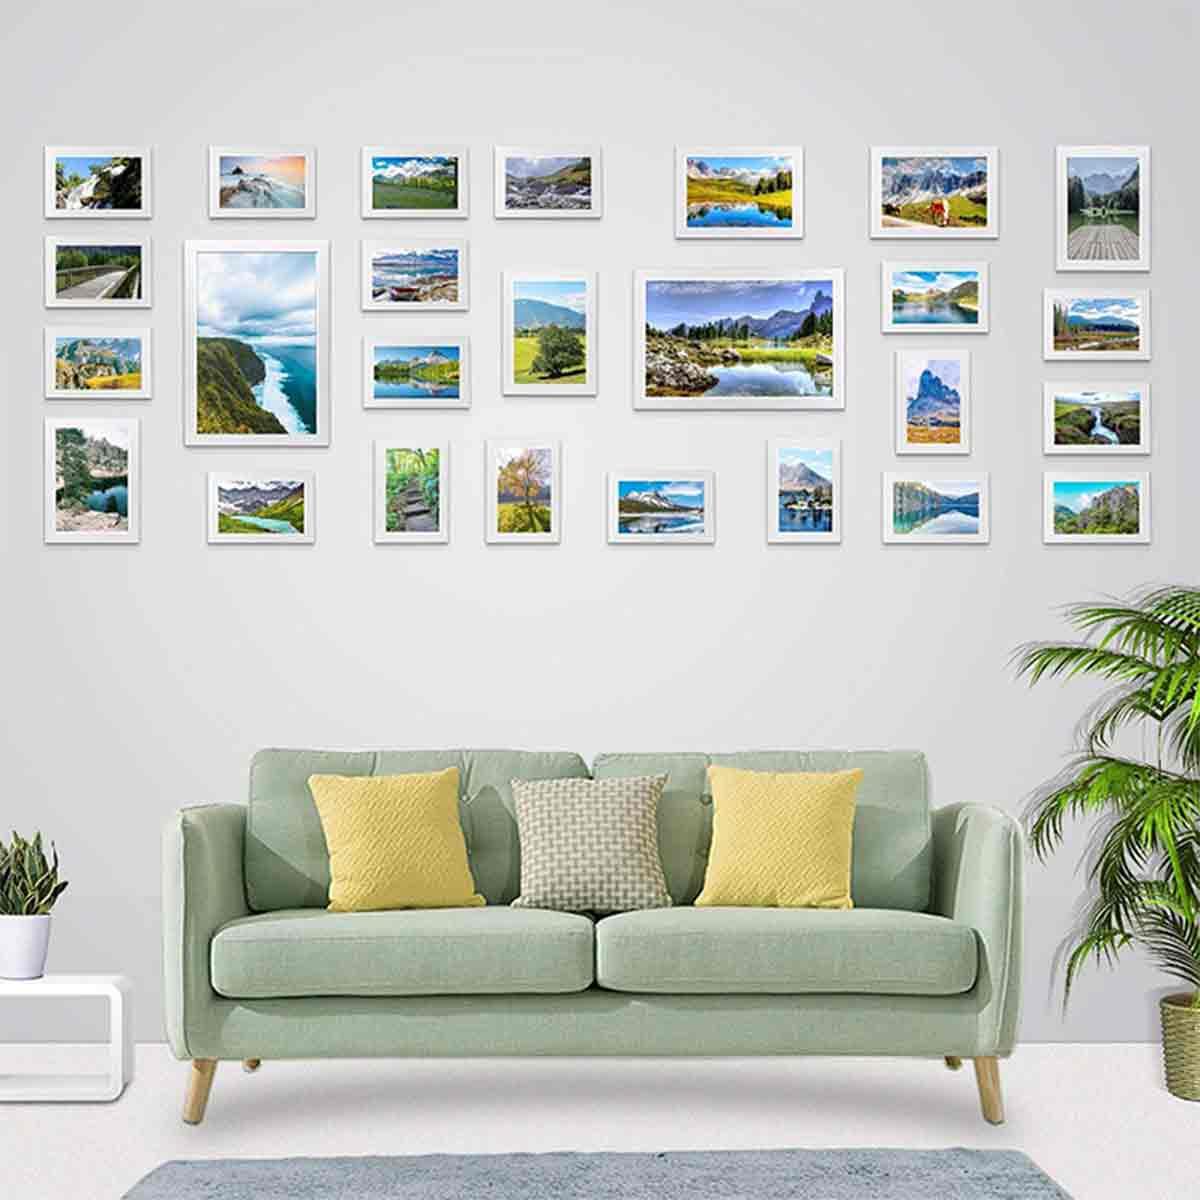 marcos multiples para 26 fotos